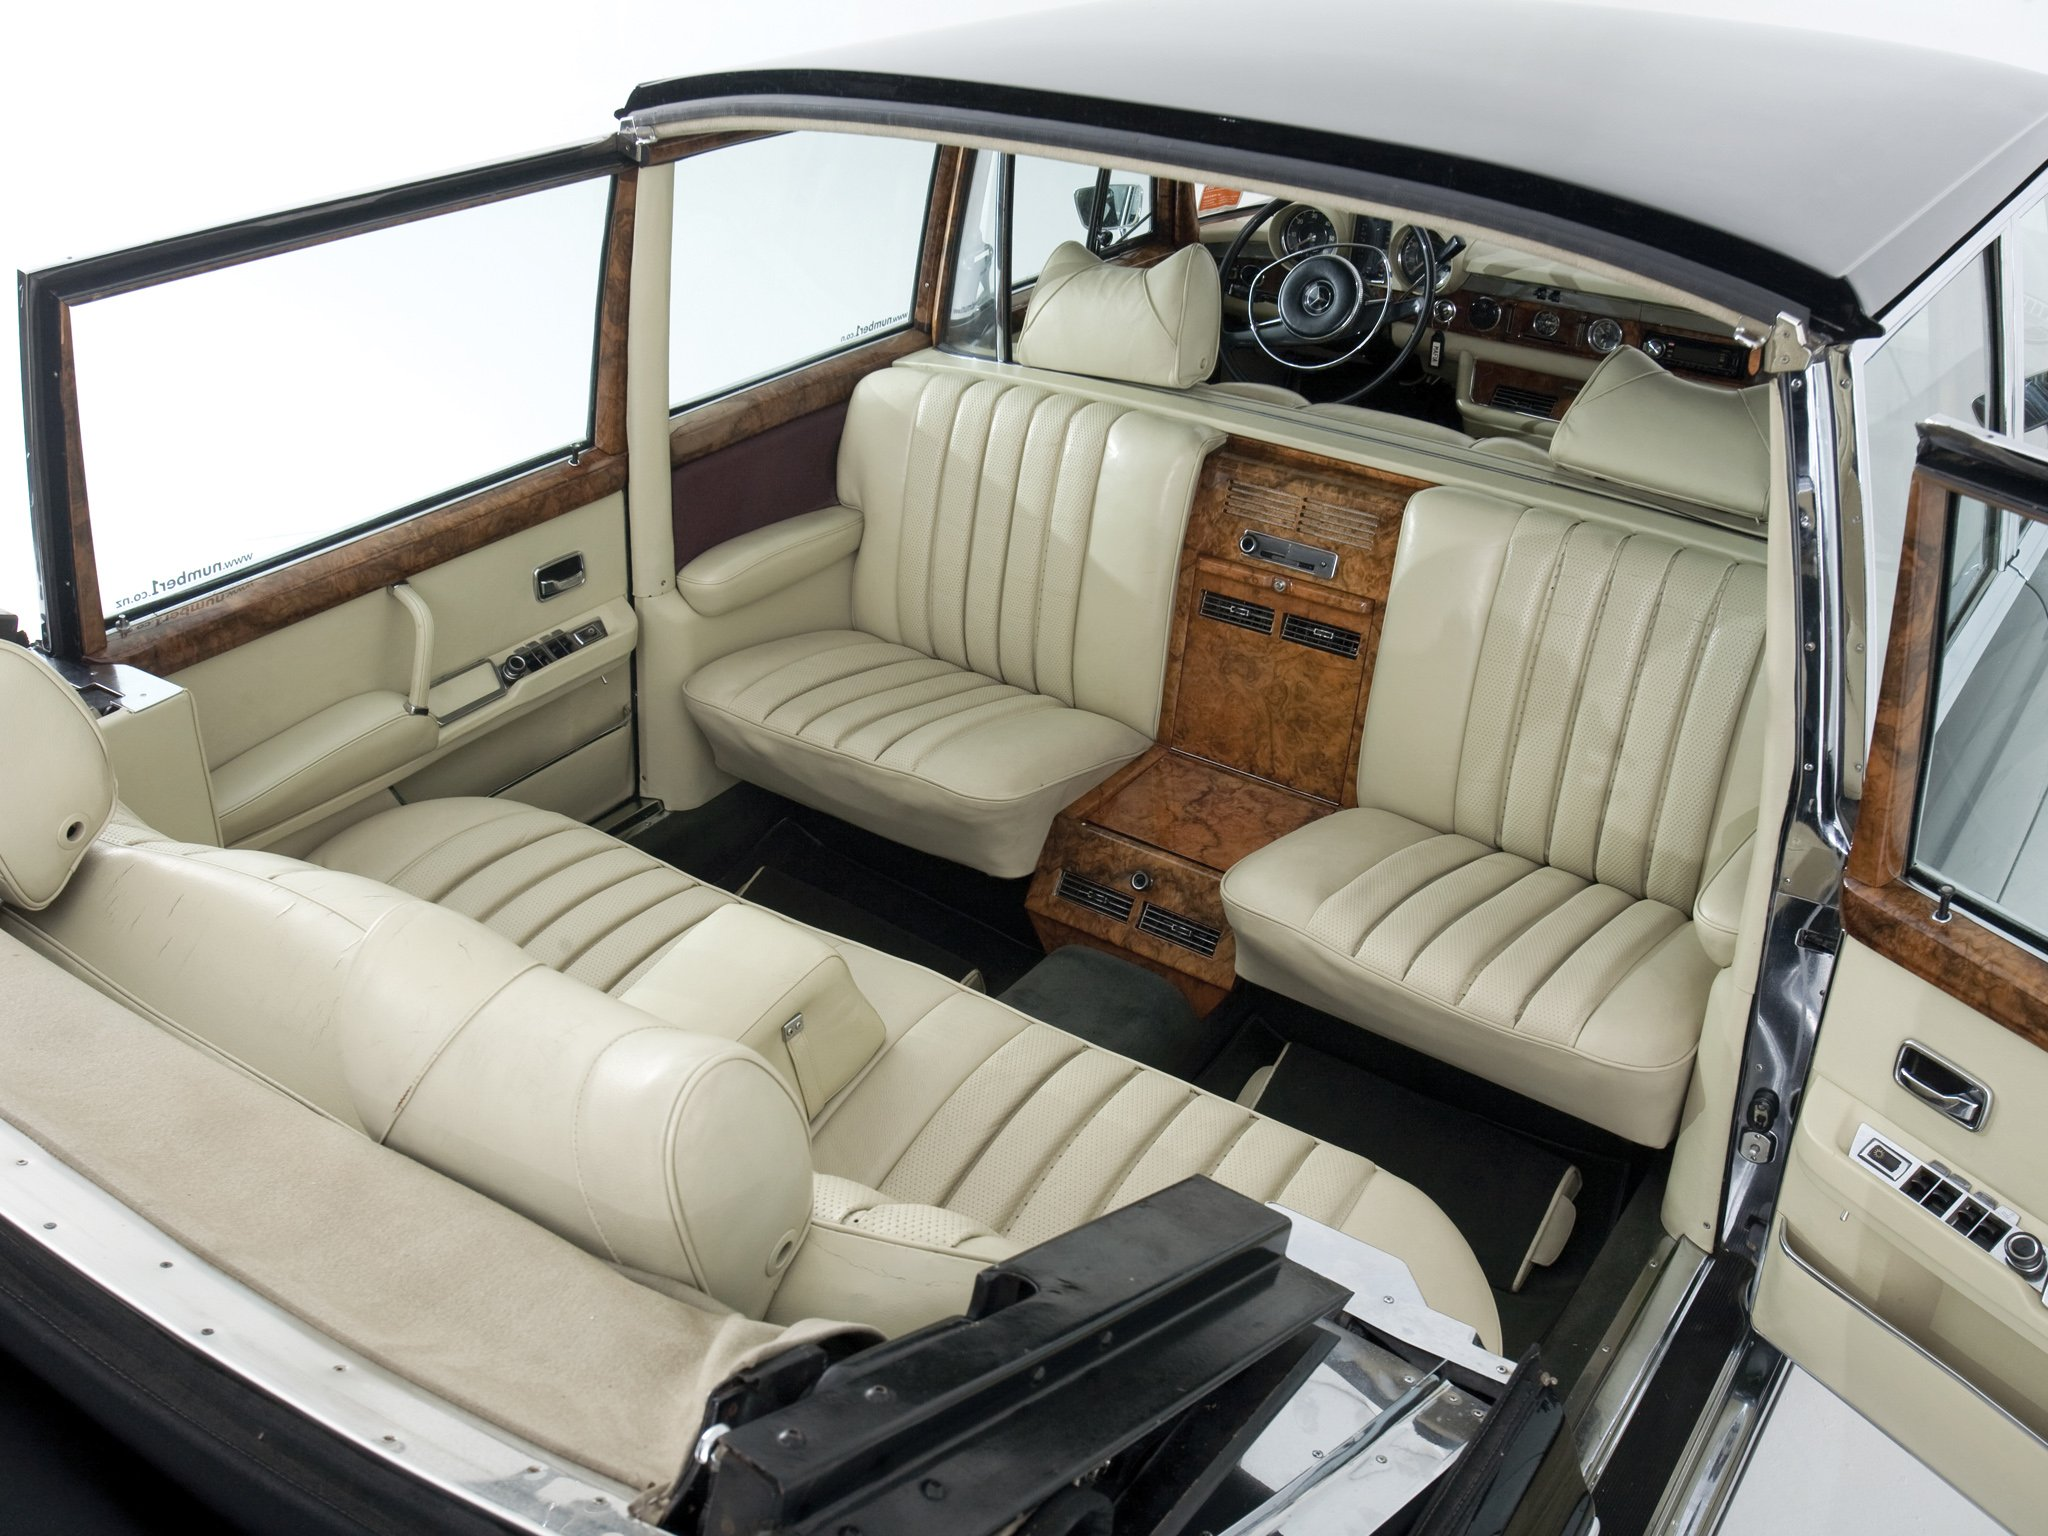 mercedes benz 600 pullman landaulet black classic cars 1965 wallpaper 2048x1536 700500. Black Bedroom Furniture Sets. Home Design Ideas